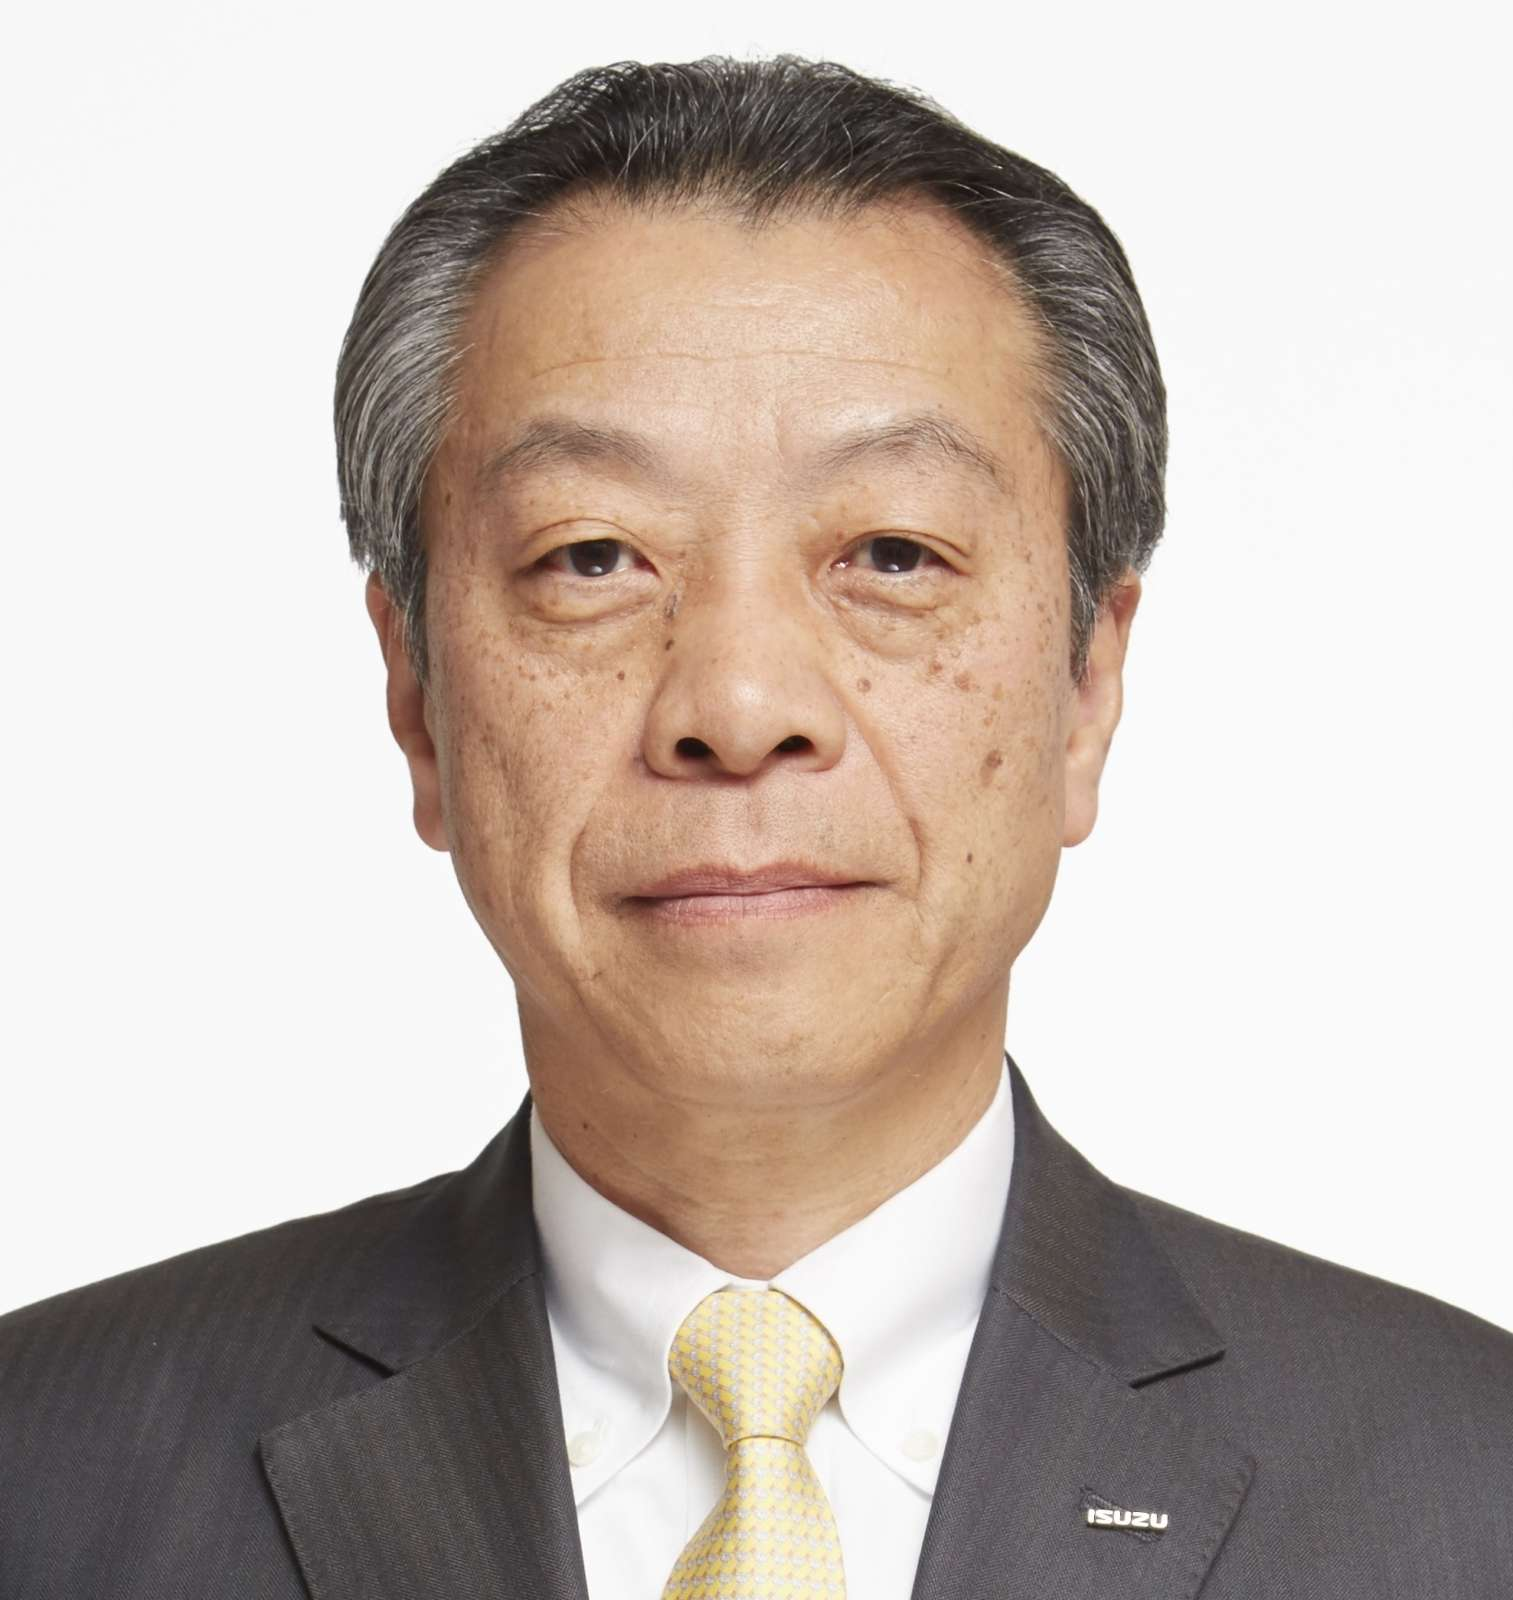 hiroshi-nakagawa-chairman-isuzu